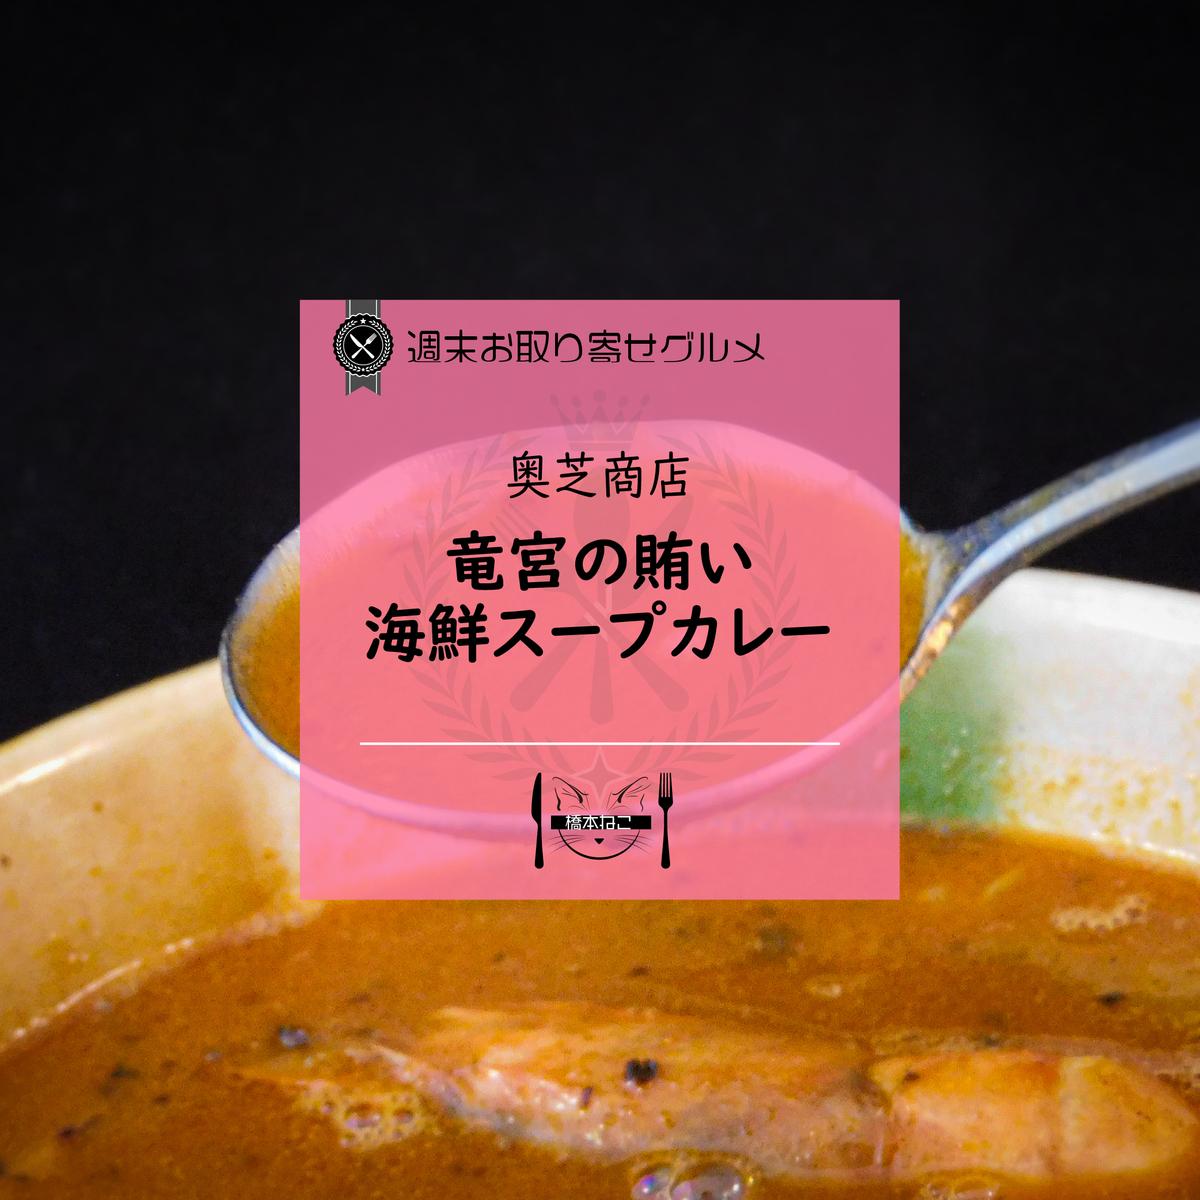 f:id:hashimoto_neko:20210723014007p:plain